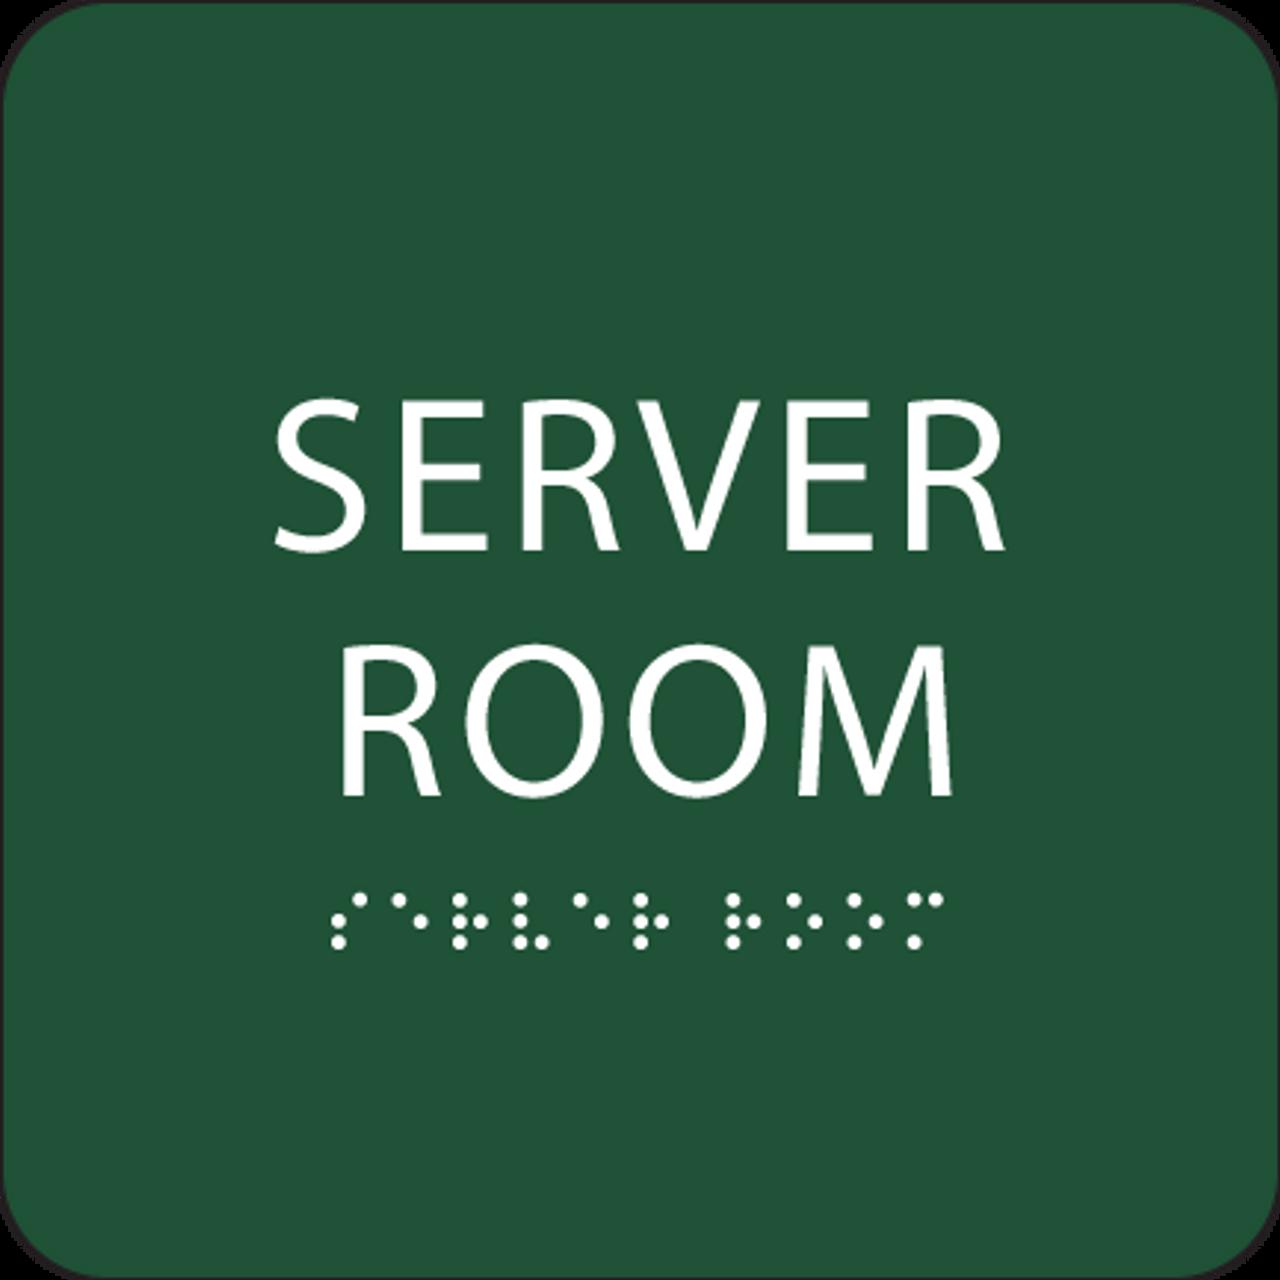 Green Server Room Braille Sign